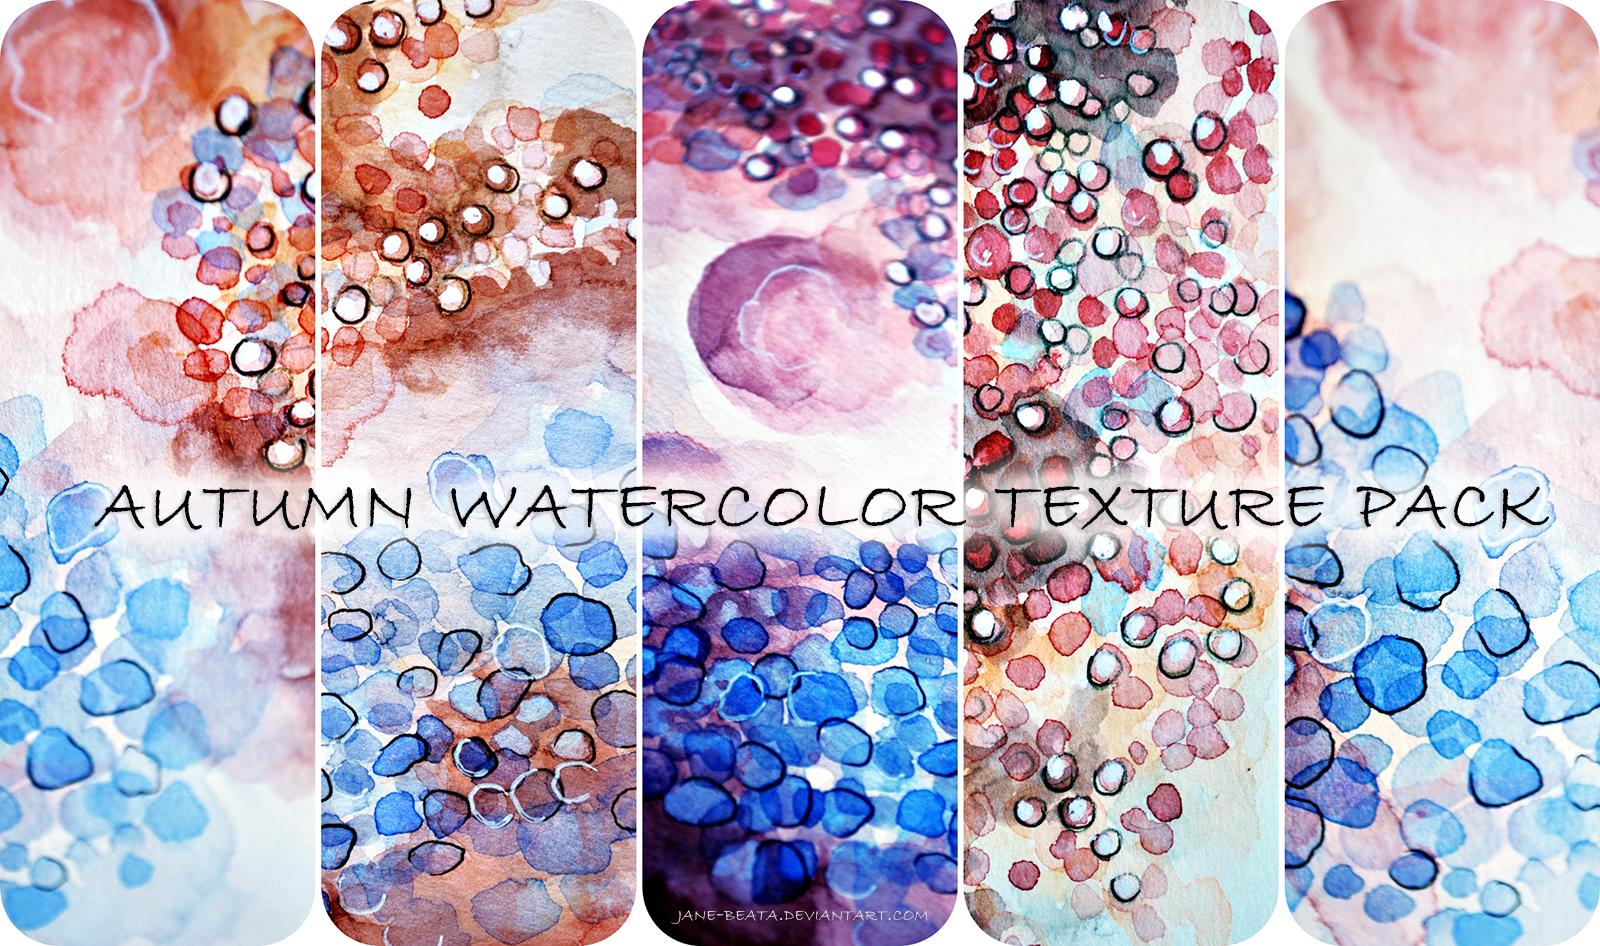 Autumn watercolor texture pack